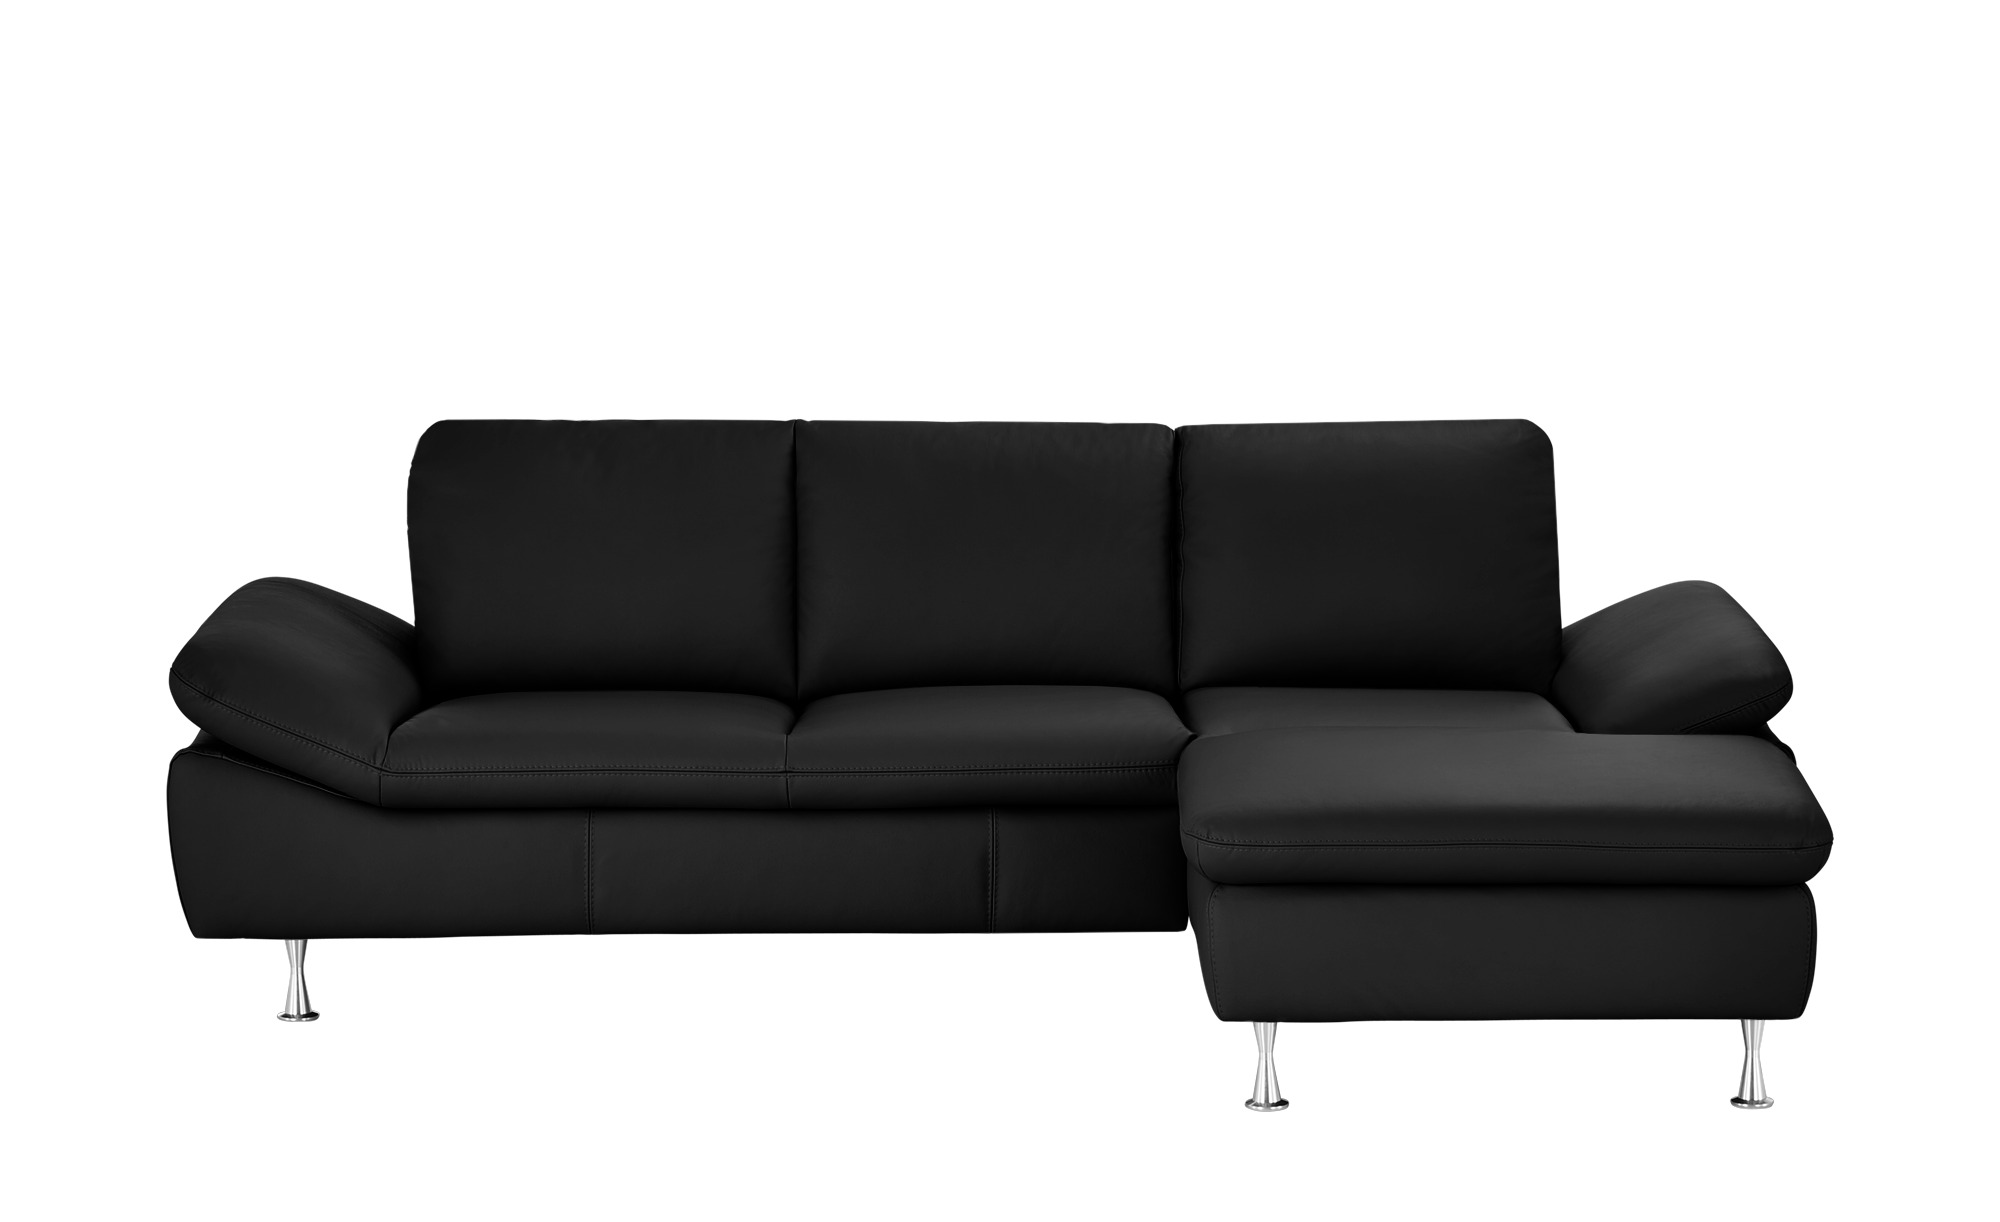 Smart Ecksofa Okelani Gefunden Bei Mobel Hoffner Sofa Couch Decor